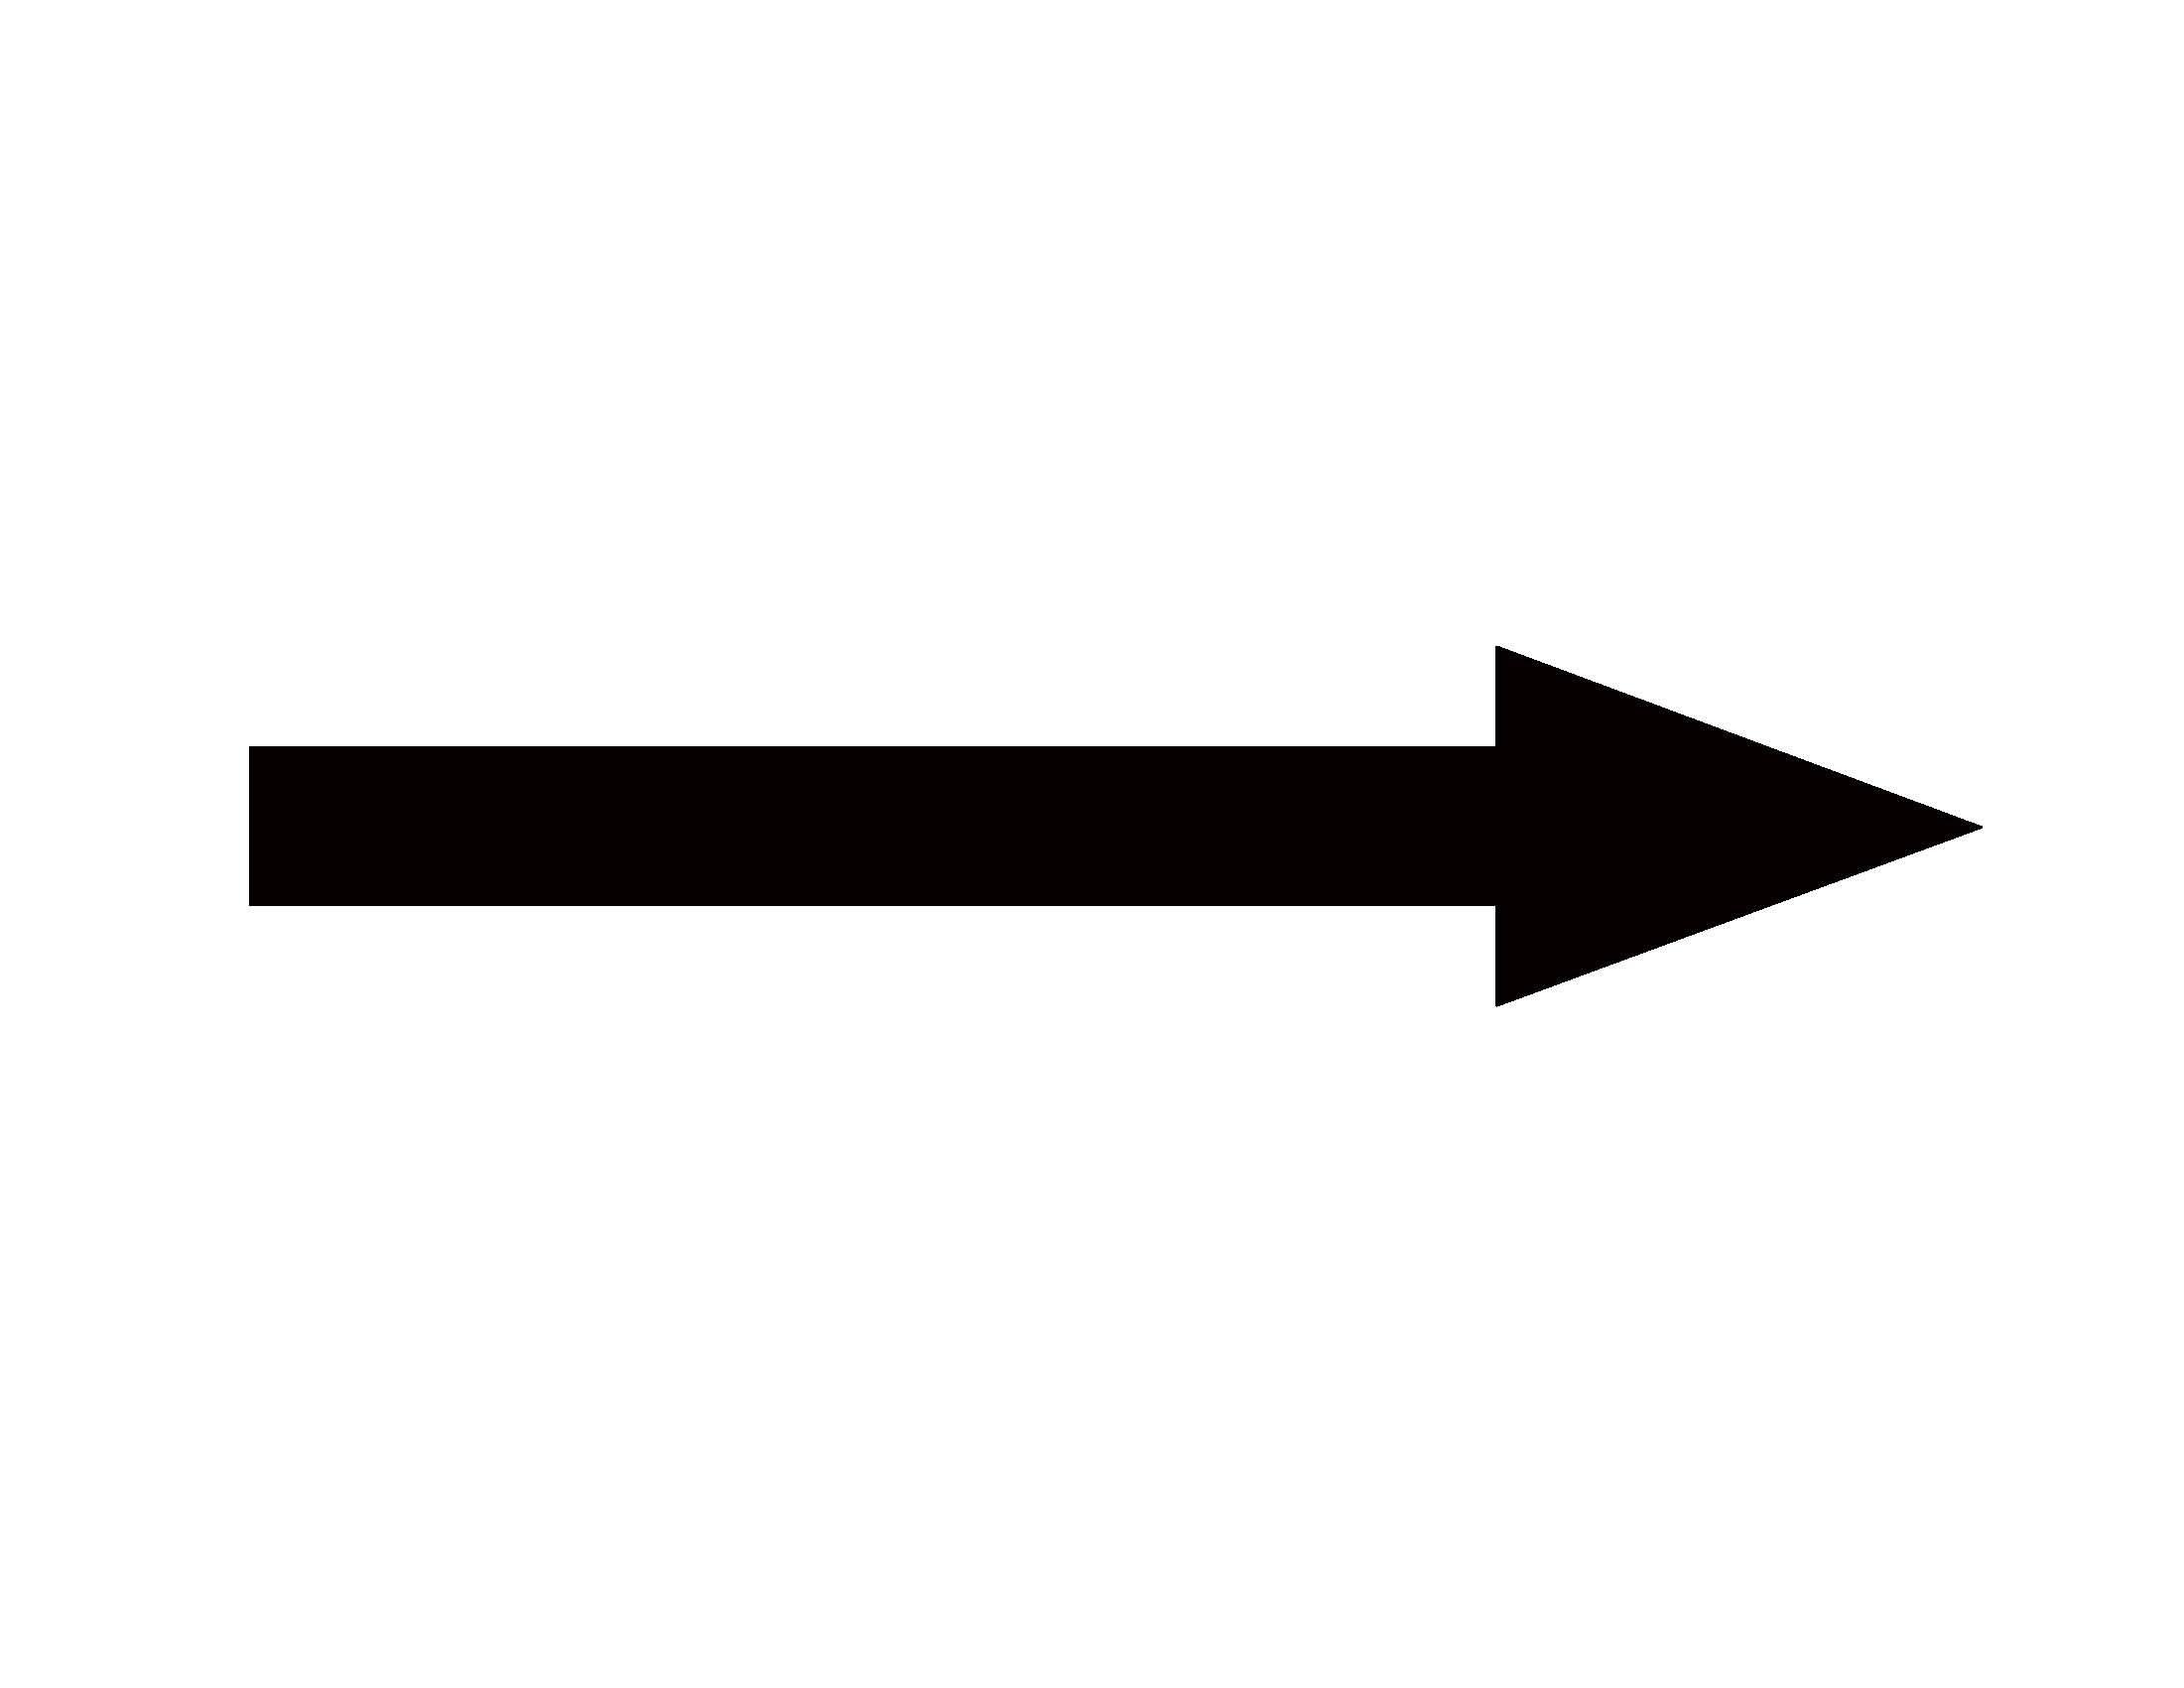 clip art freeuse stock Cliparts download clip art. Free clipart arrows